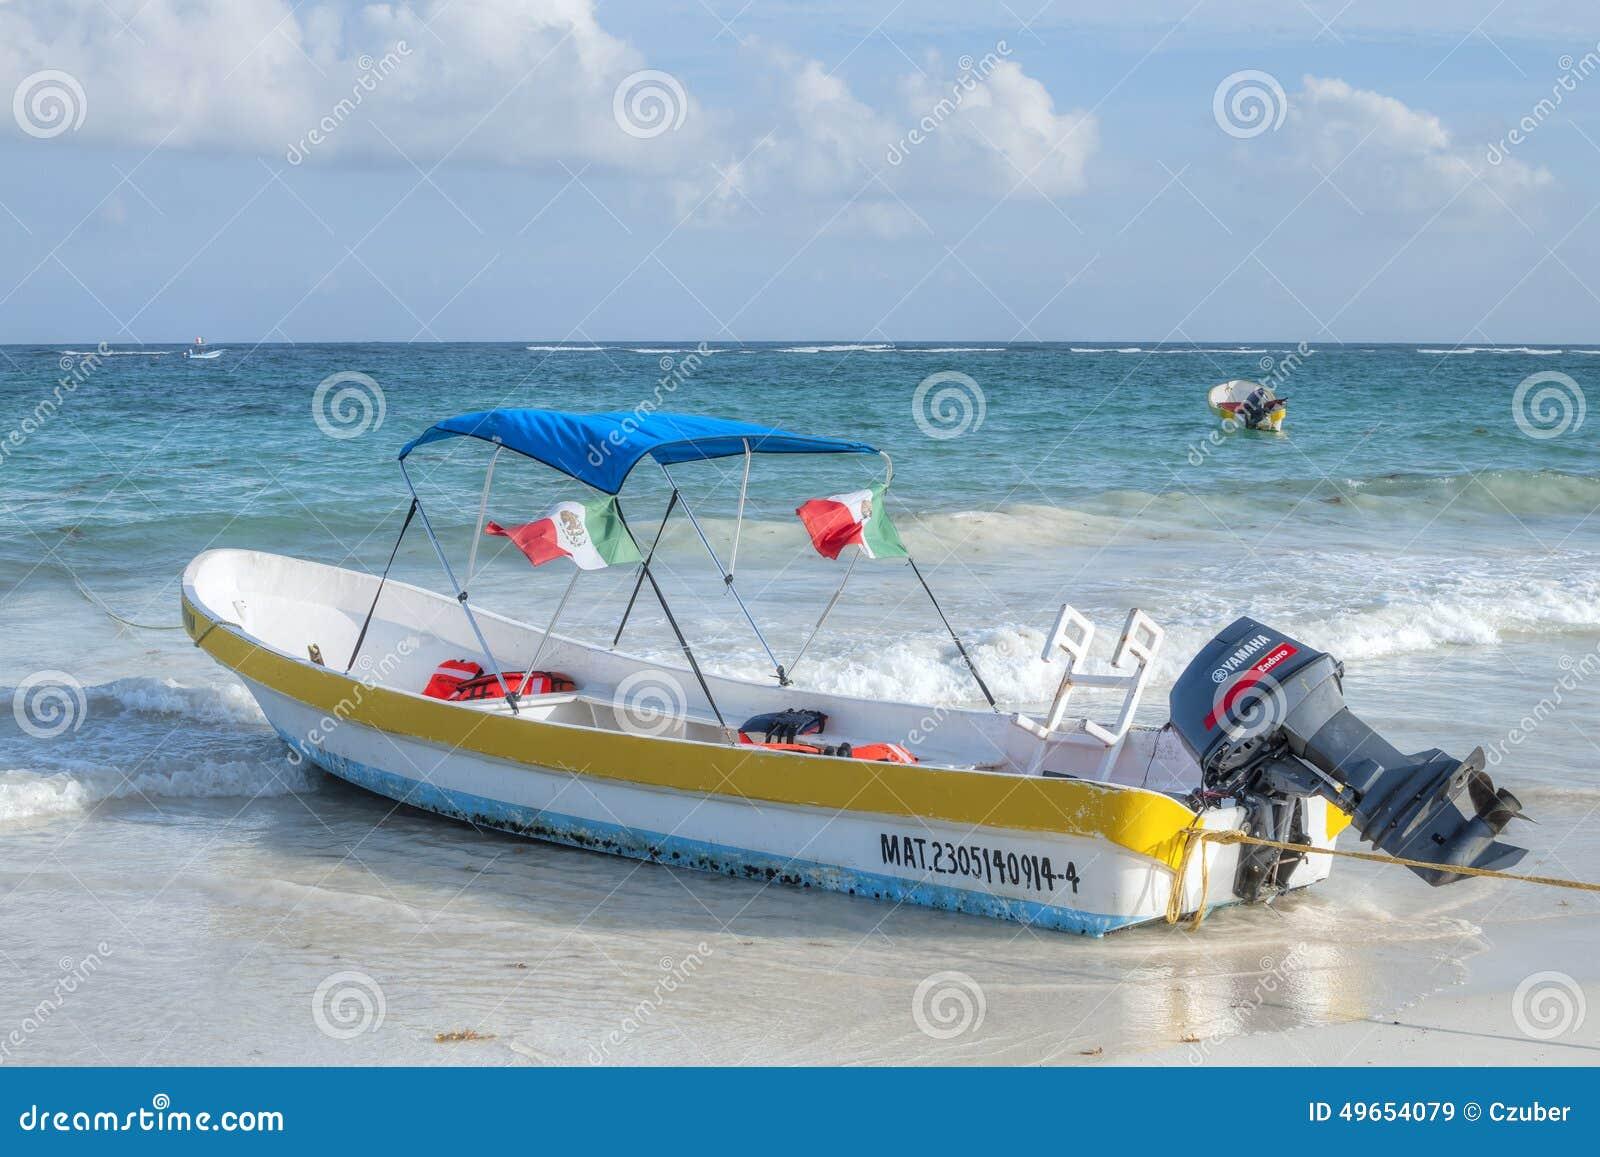 Local Mexican panga boat